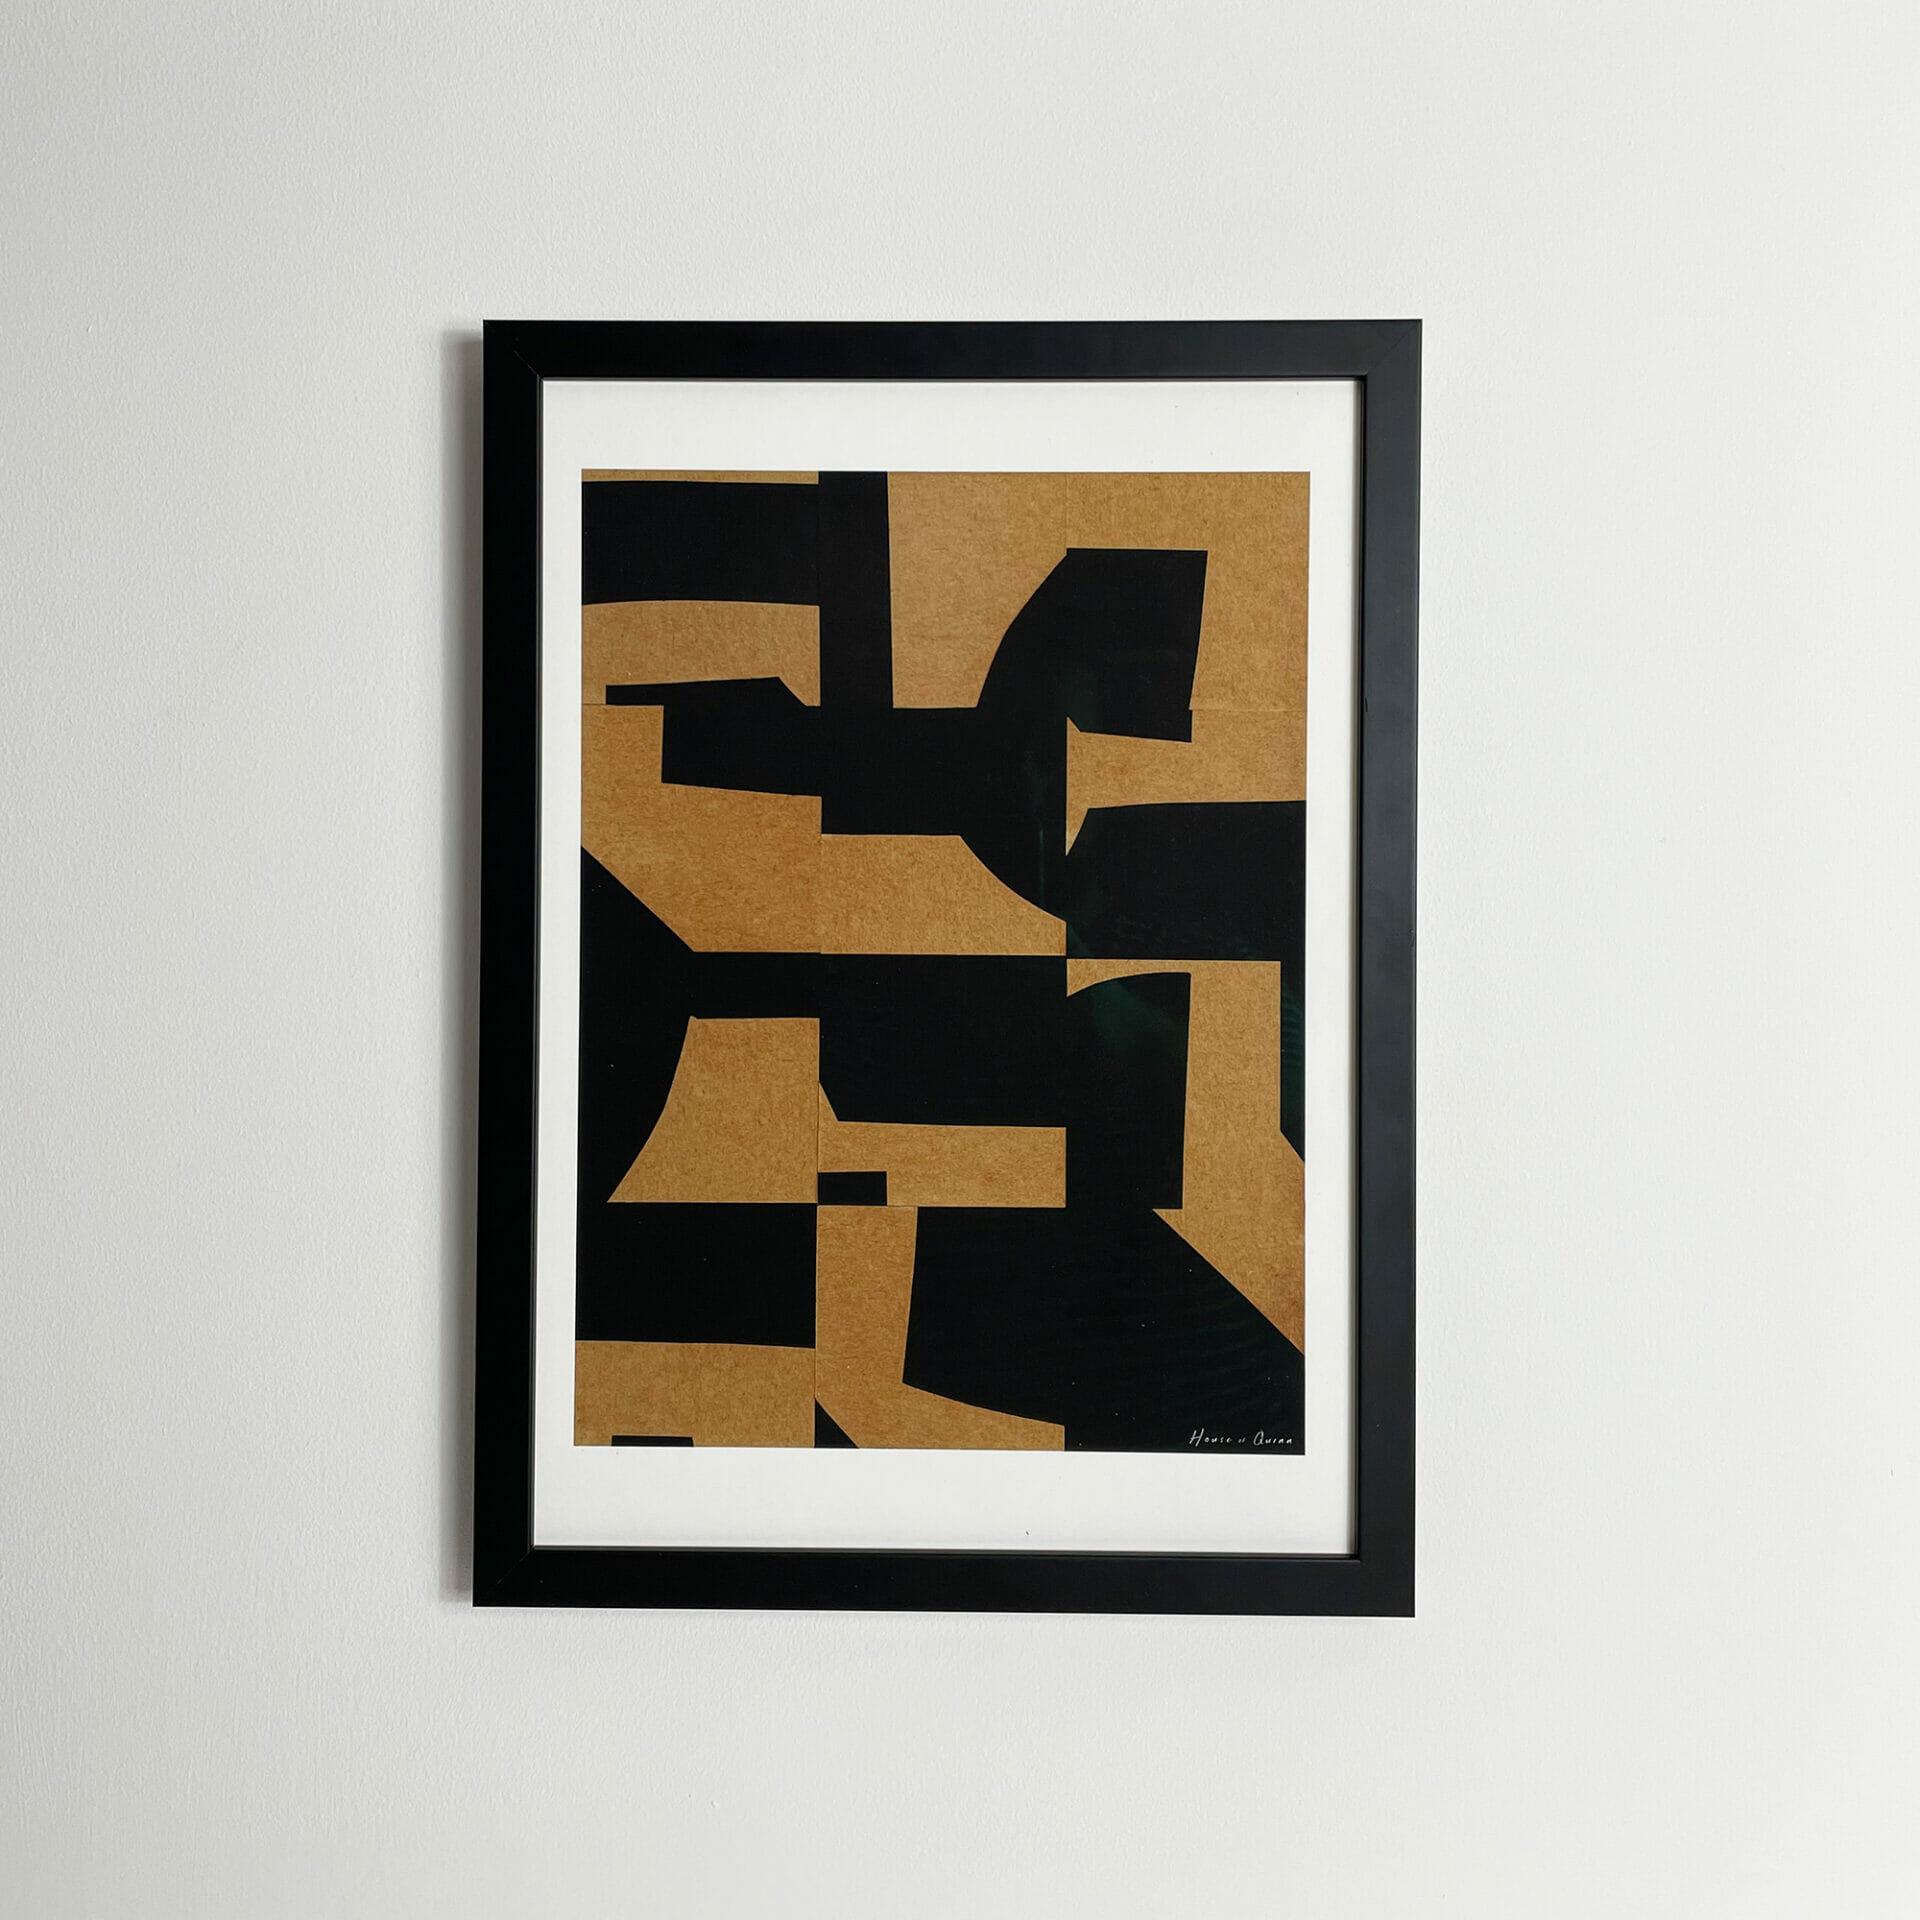 reassembled-I-print-abstract-brown-black-wall-artwork